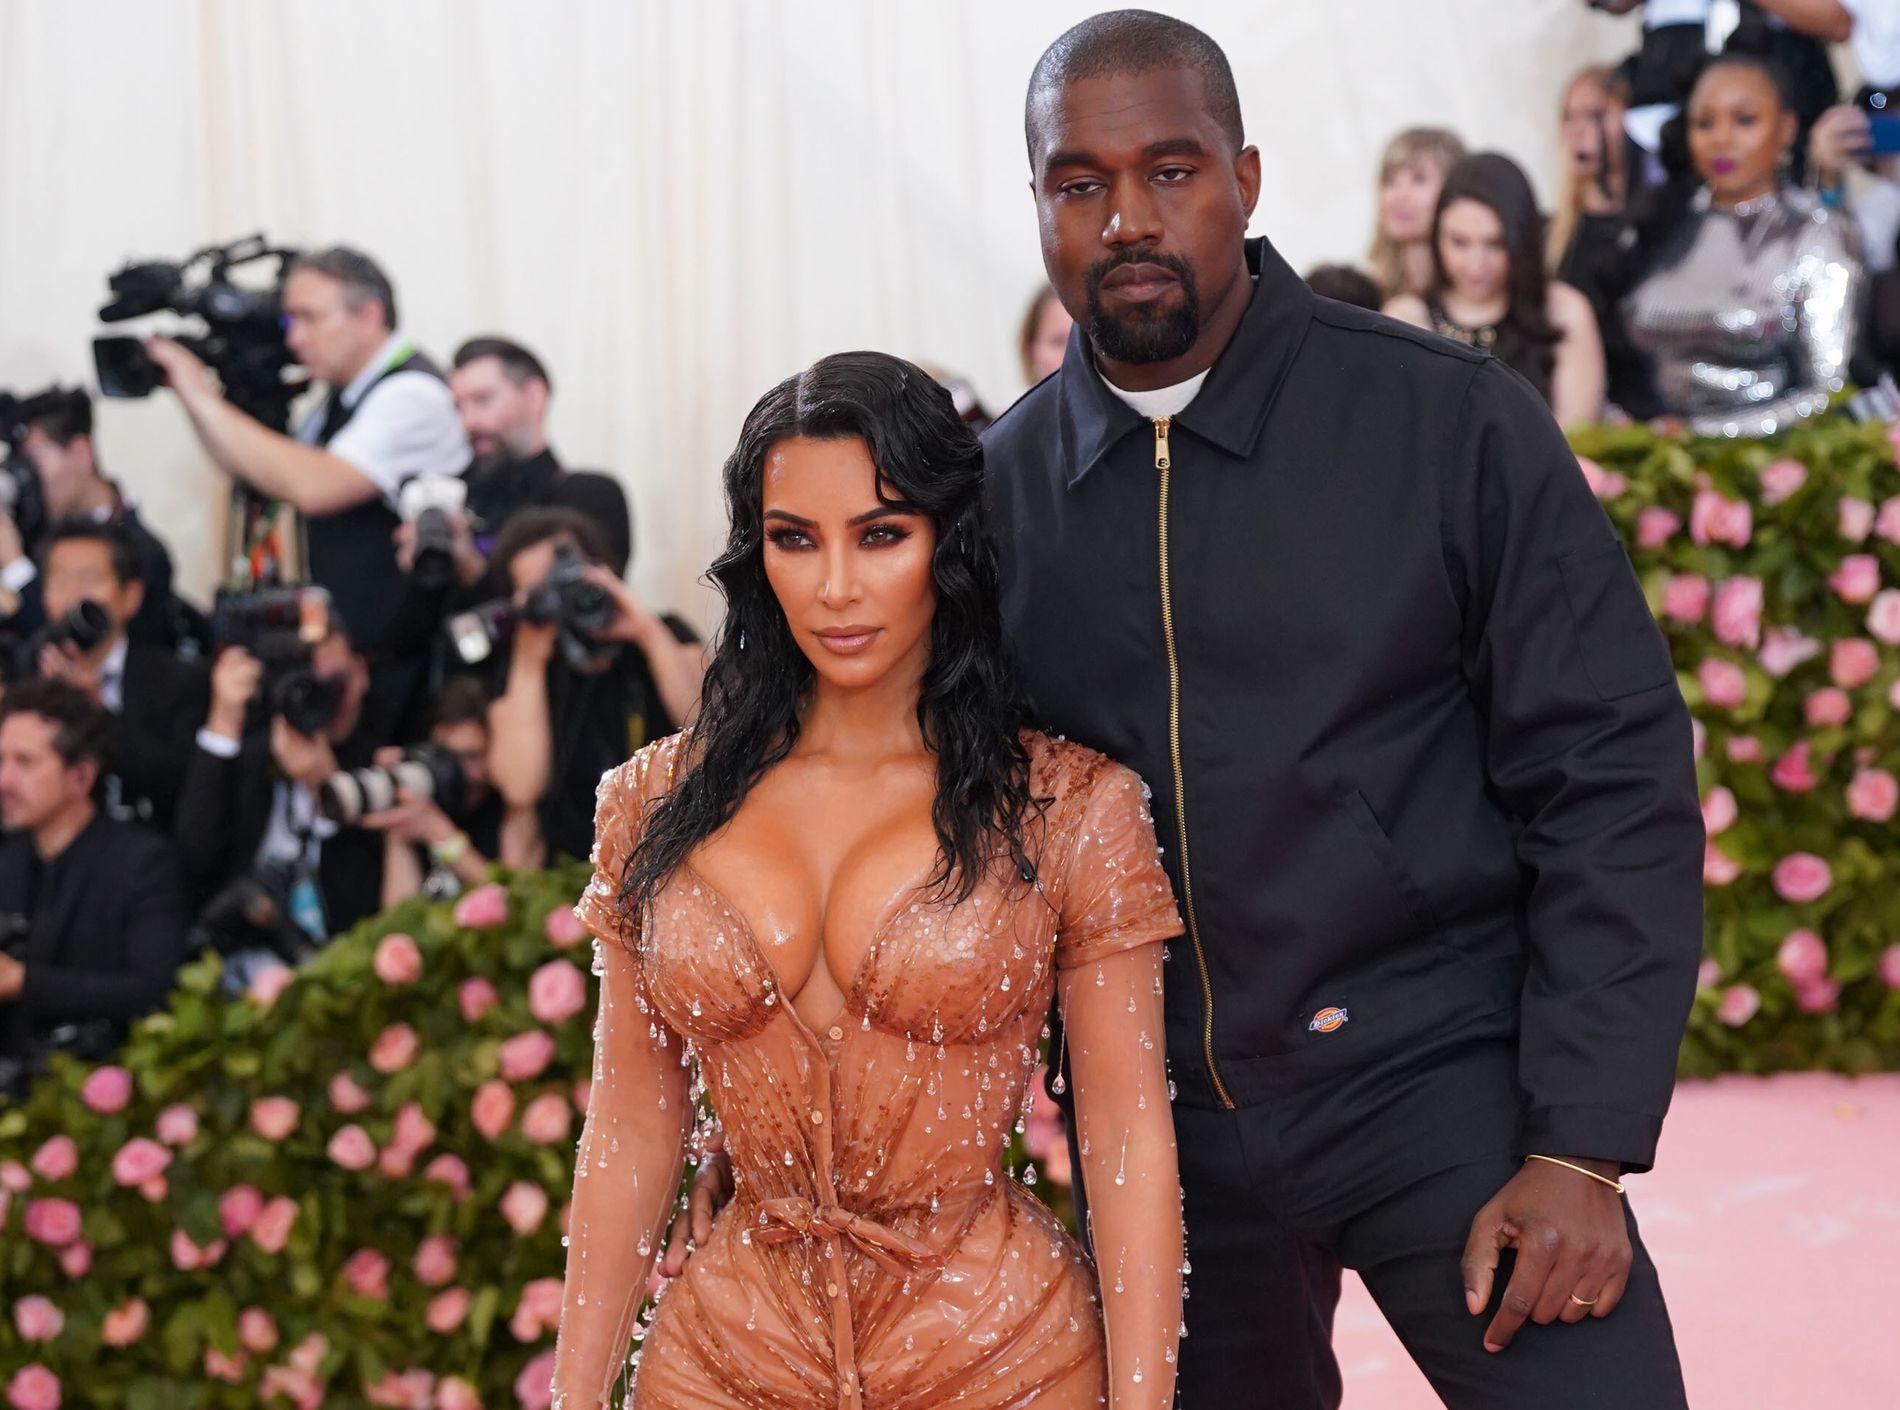 FORELDRE IGJEN: Kim Kardashian West og Kanye West på Met-gallaen tidligere i uken.